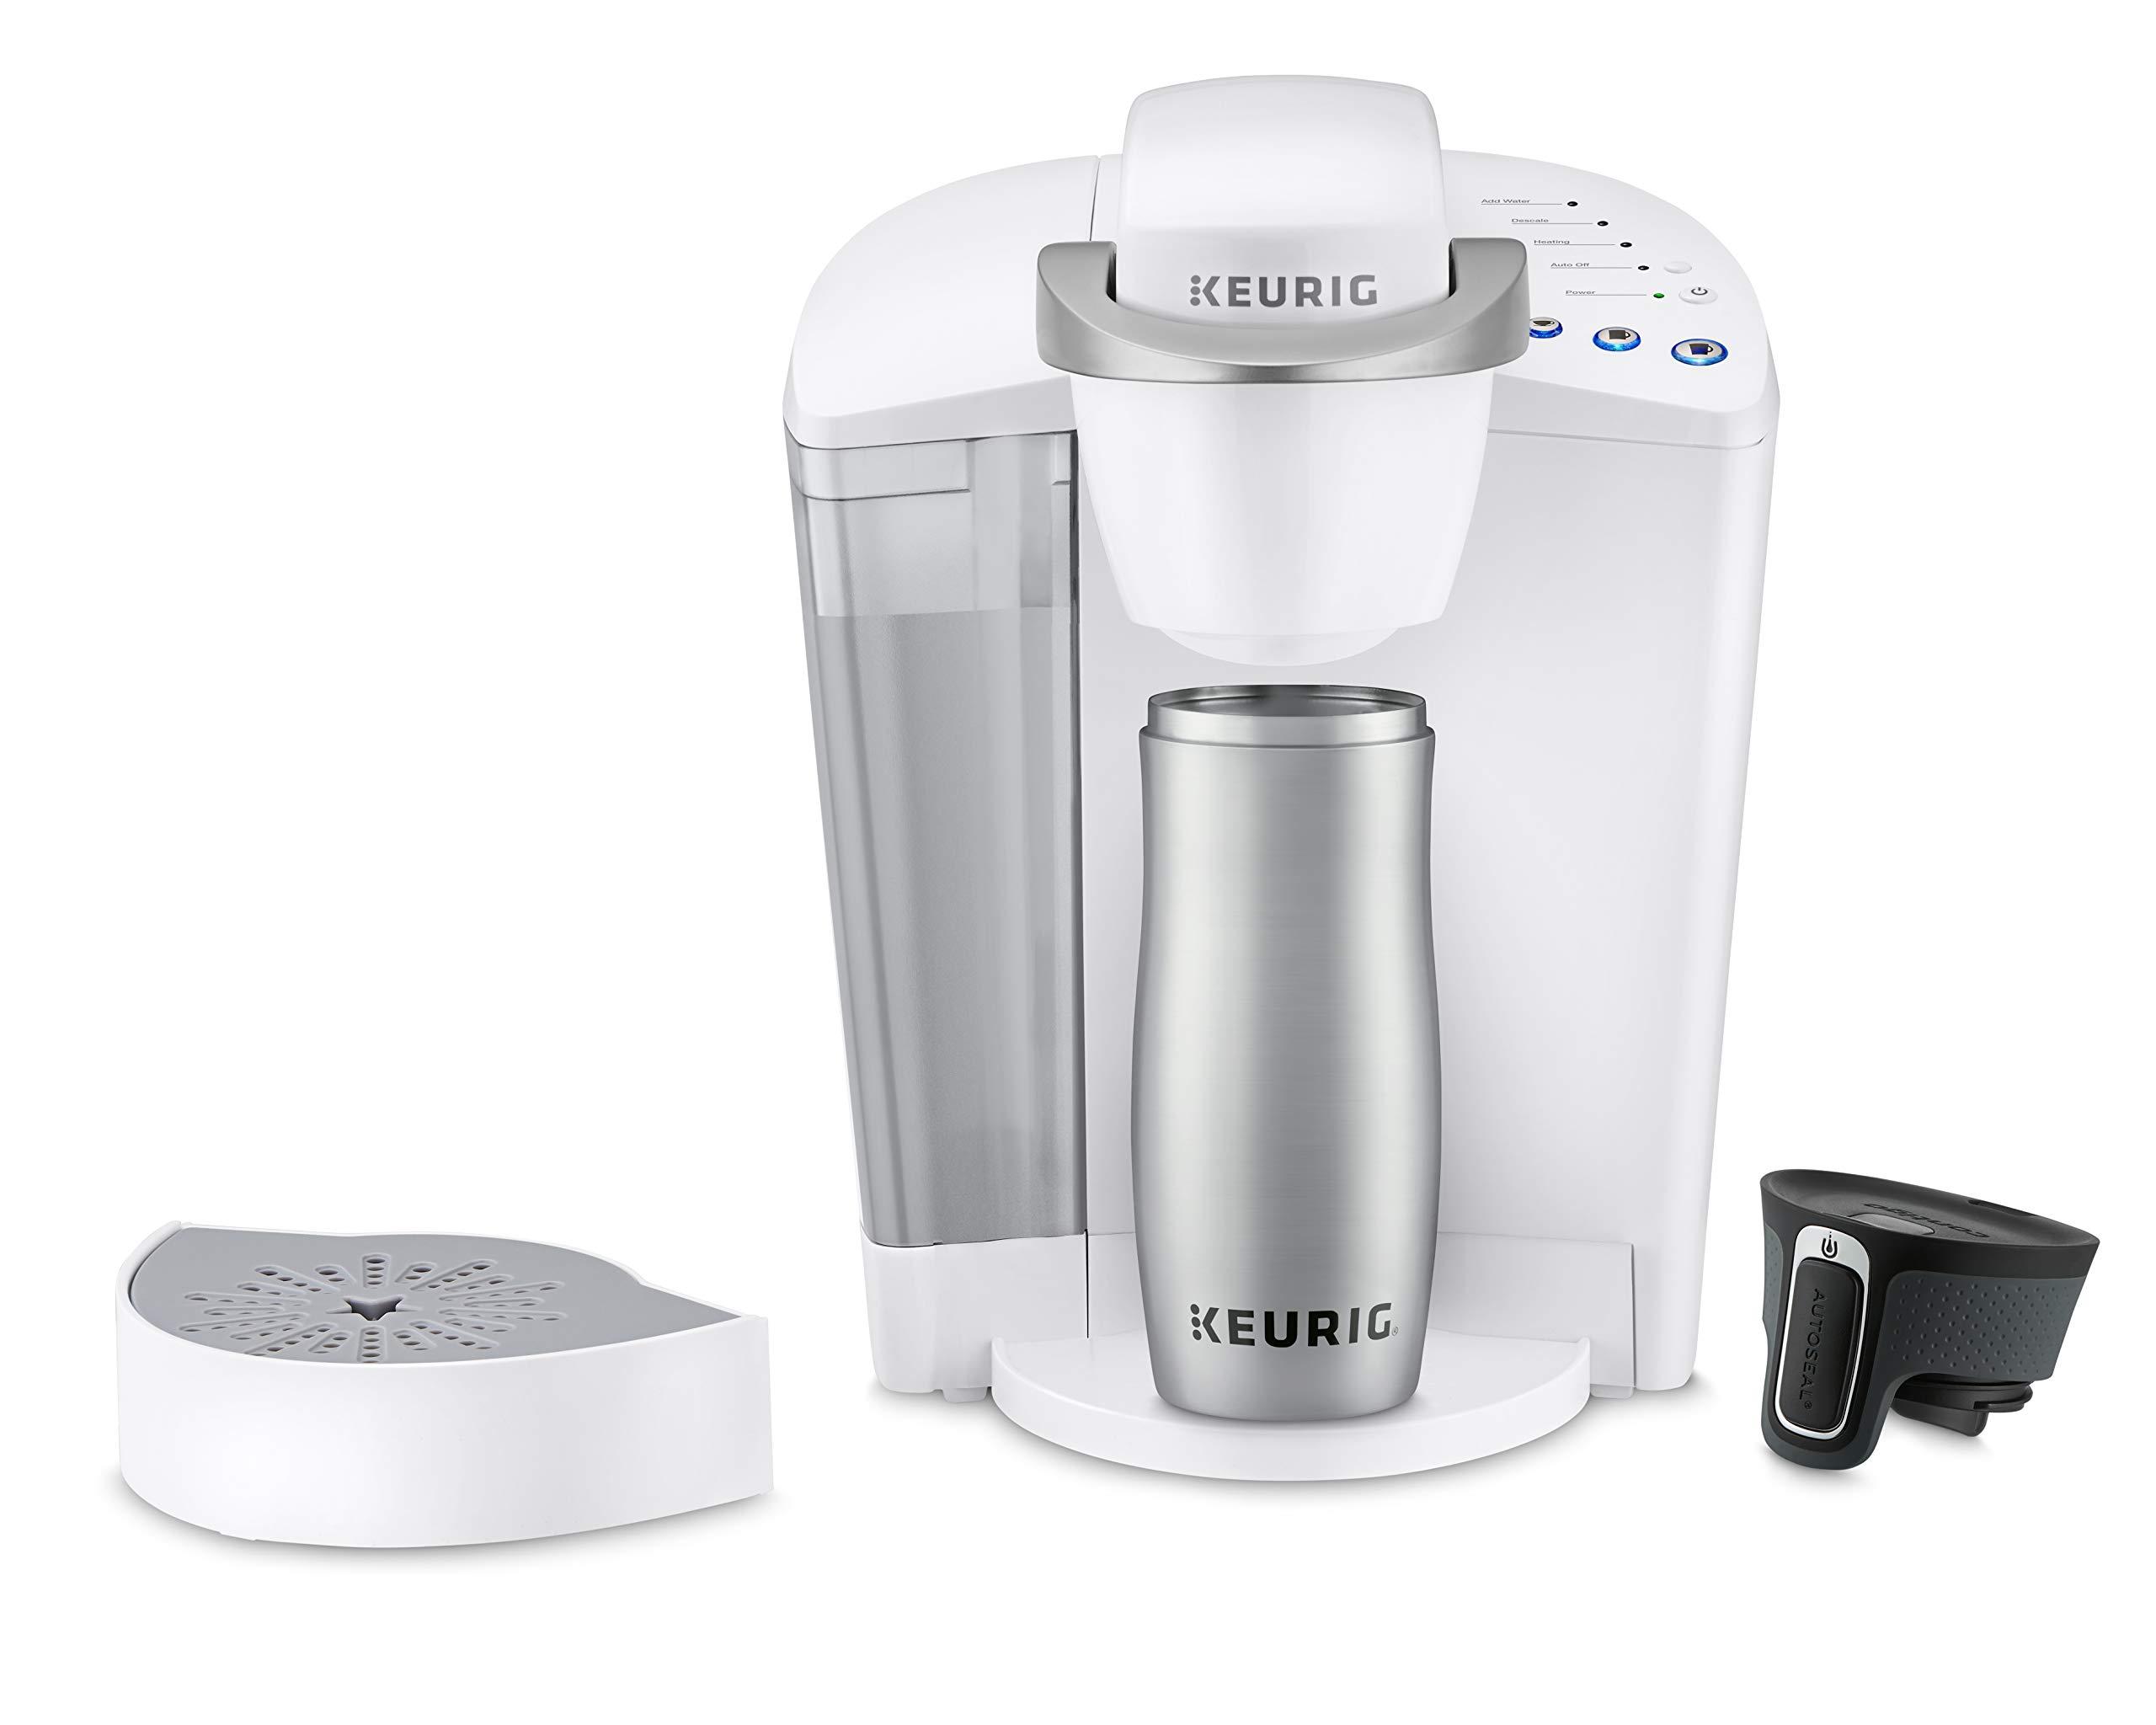 Keurig K-Classic Coffee Maker, K-Cup Pod, Single Serve, Programmable, White by Keurig (Image #4)